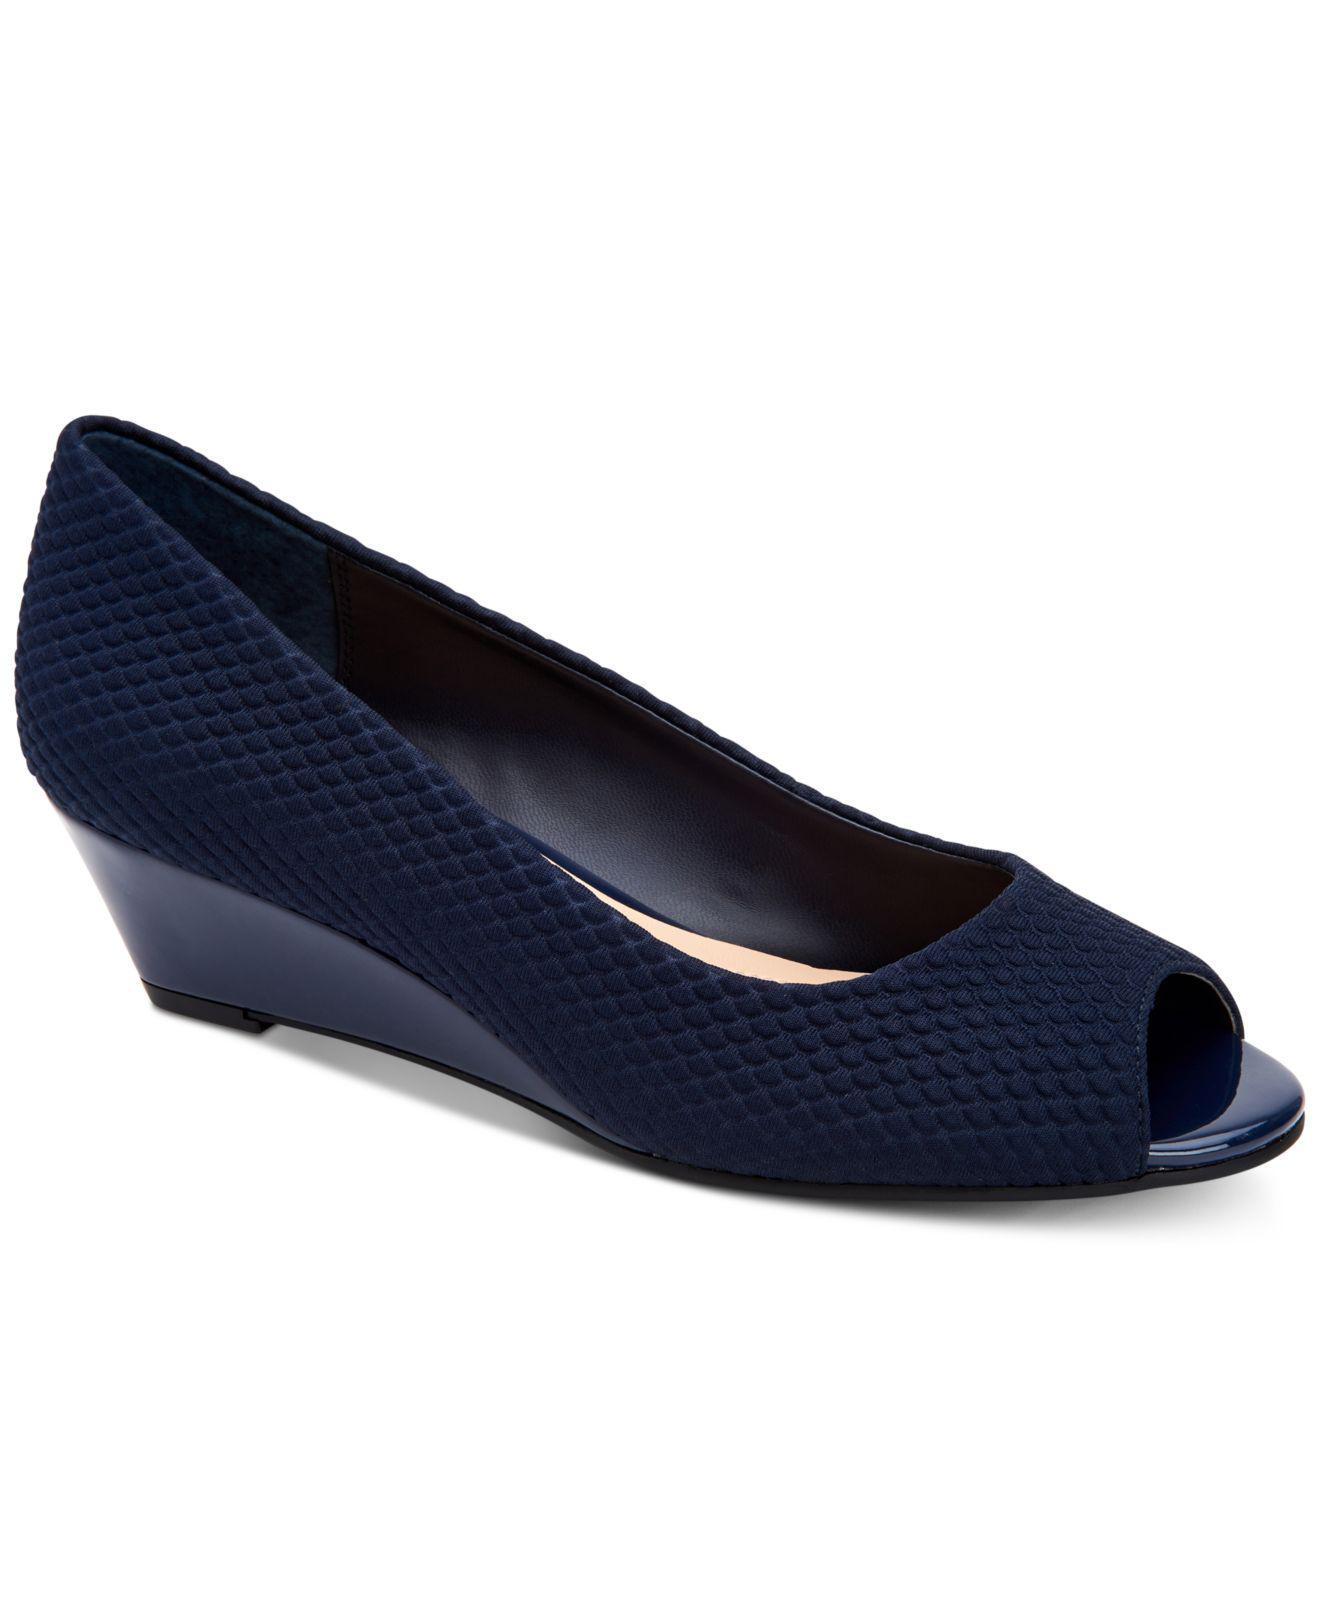 f9ffdb9591e Lyst - Alfani Women s Step  n Flex Cammi Wedges in Blue